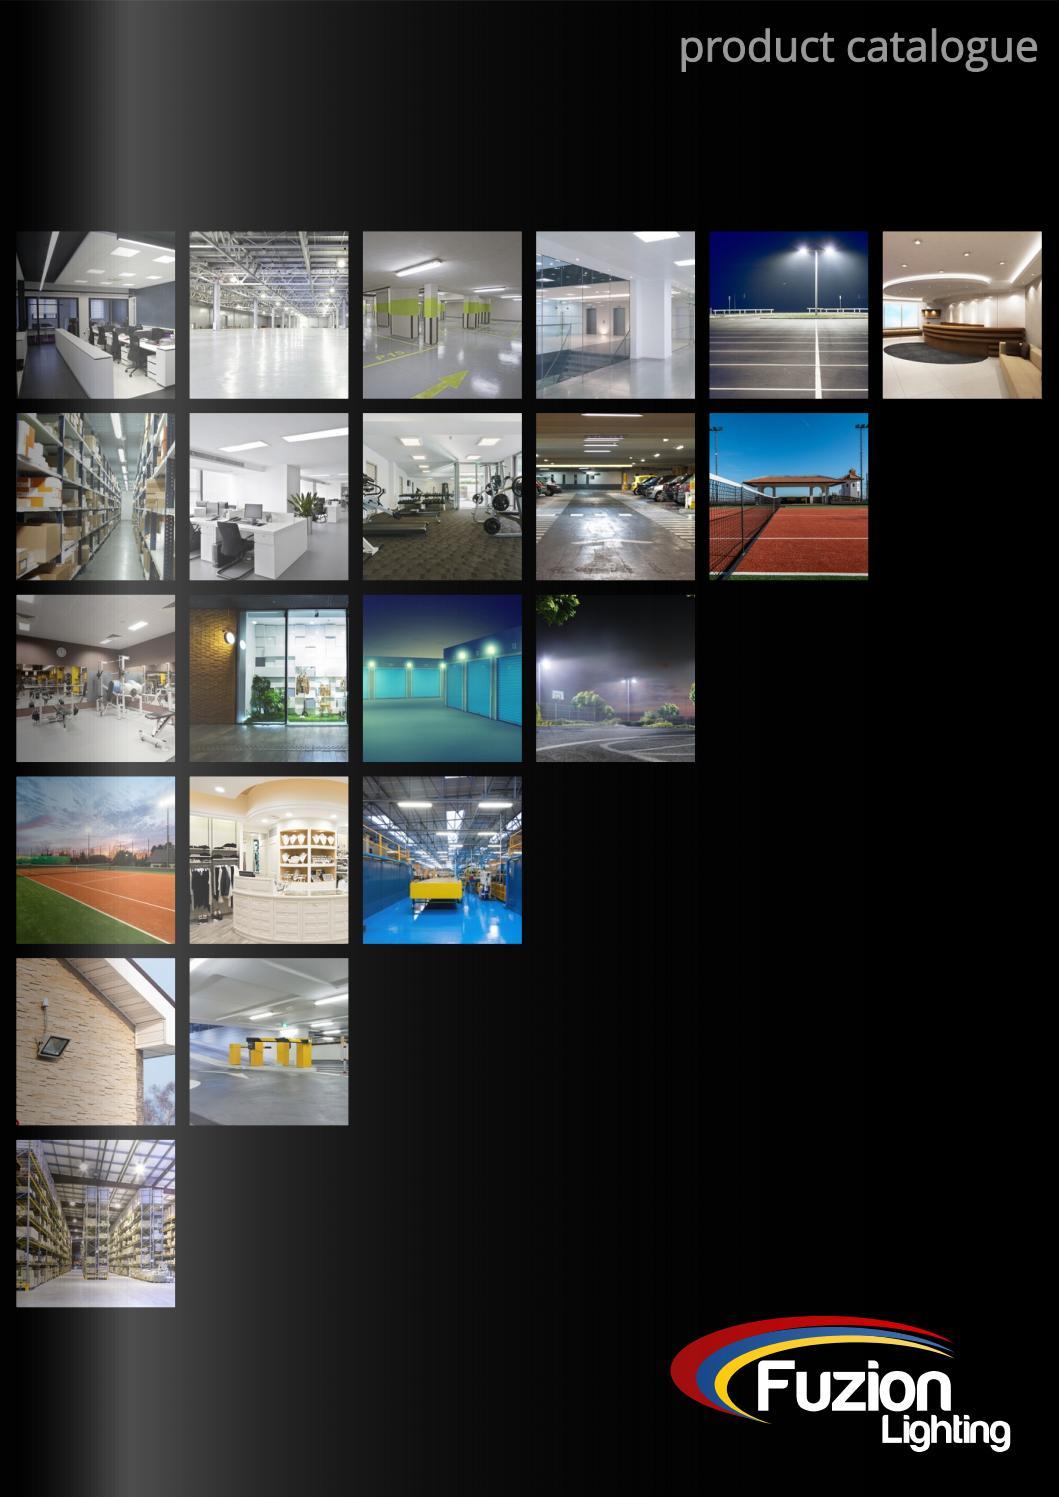 Fuzion Lighting Product Catalogue 2018 By Fuzion Lighting Issuu